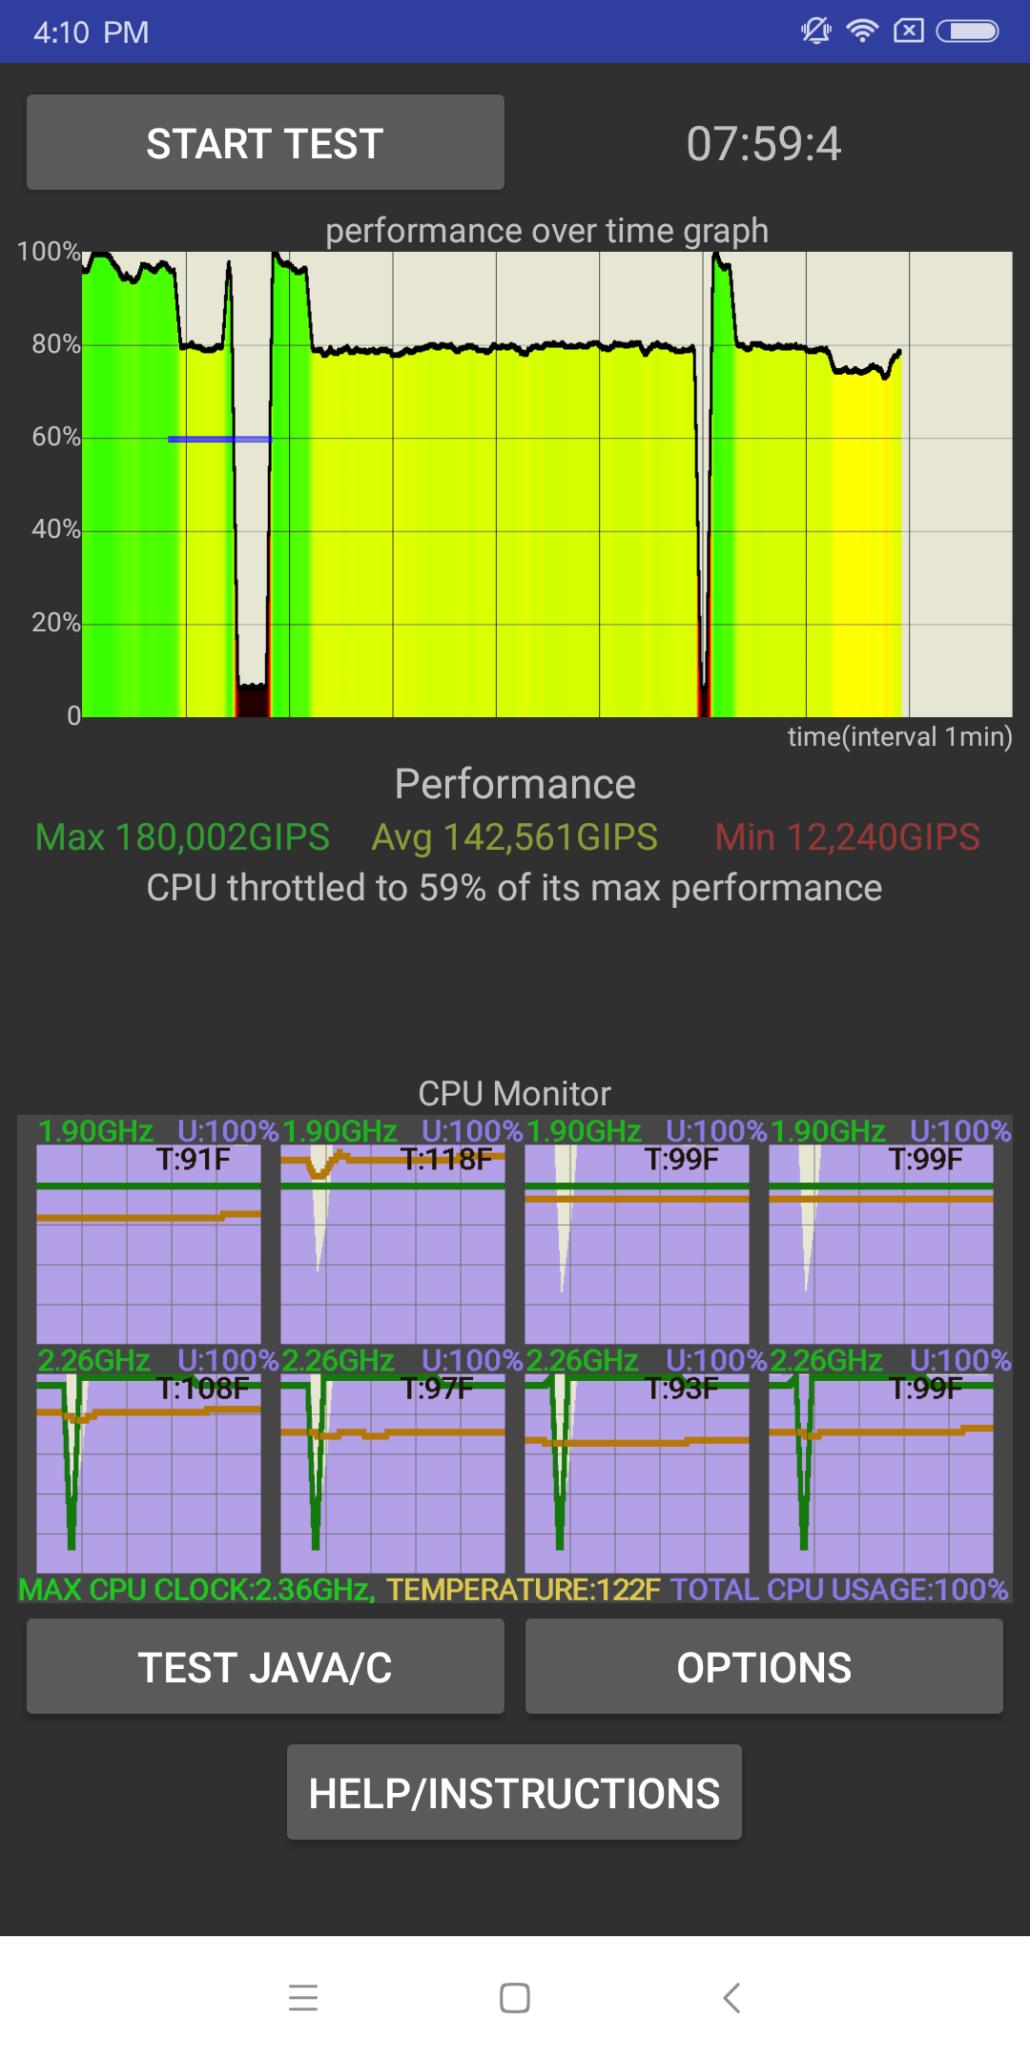 screenshot_2018-01-29-16-10-04-349_skynet-cputhrottlingtest